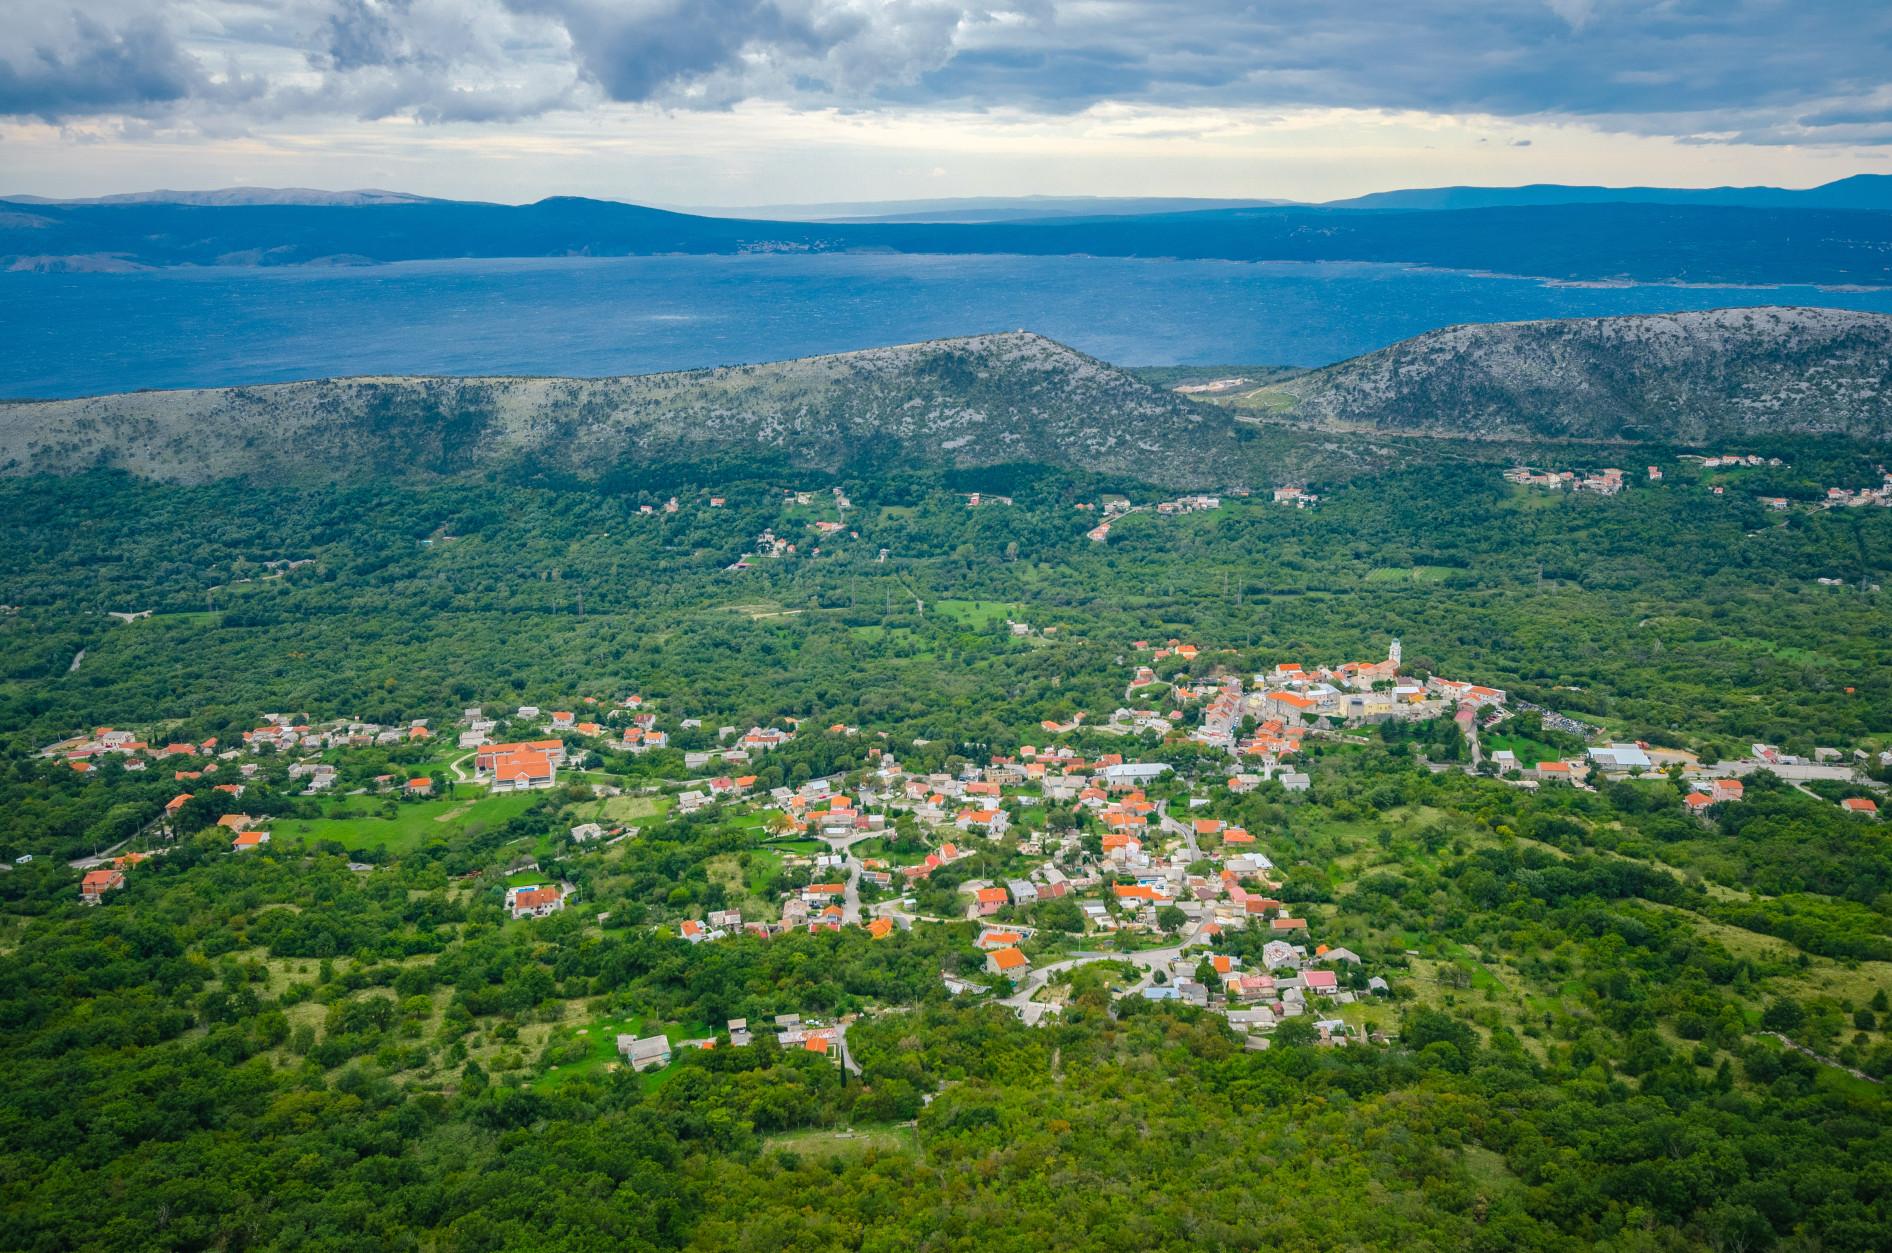 Općina Vinodolska